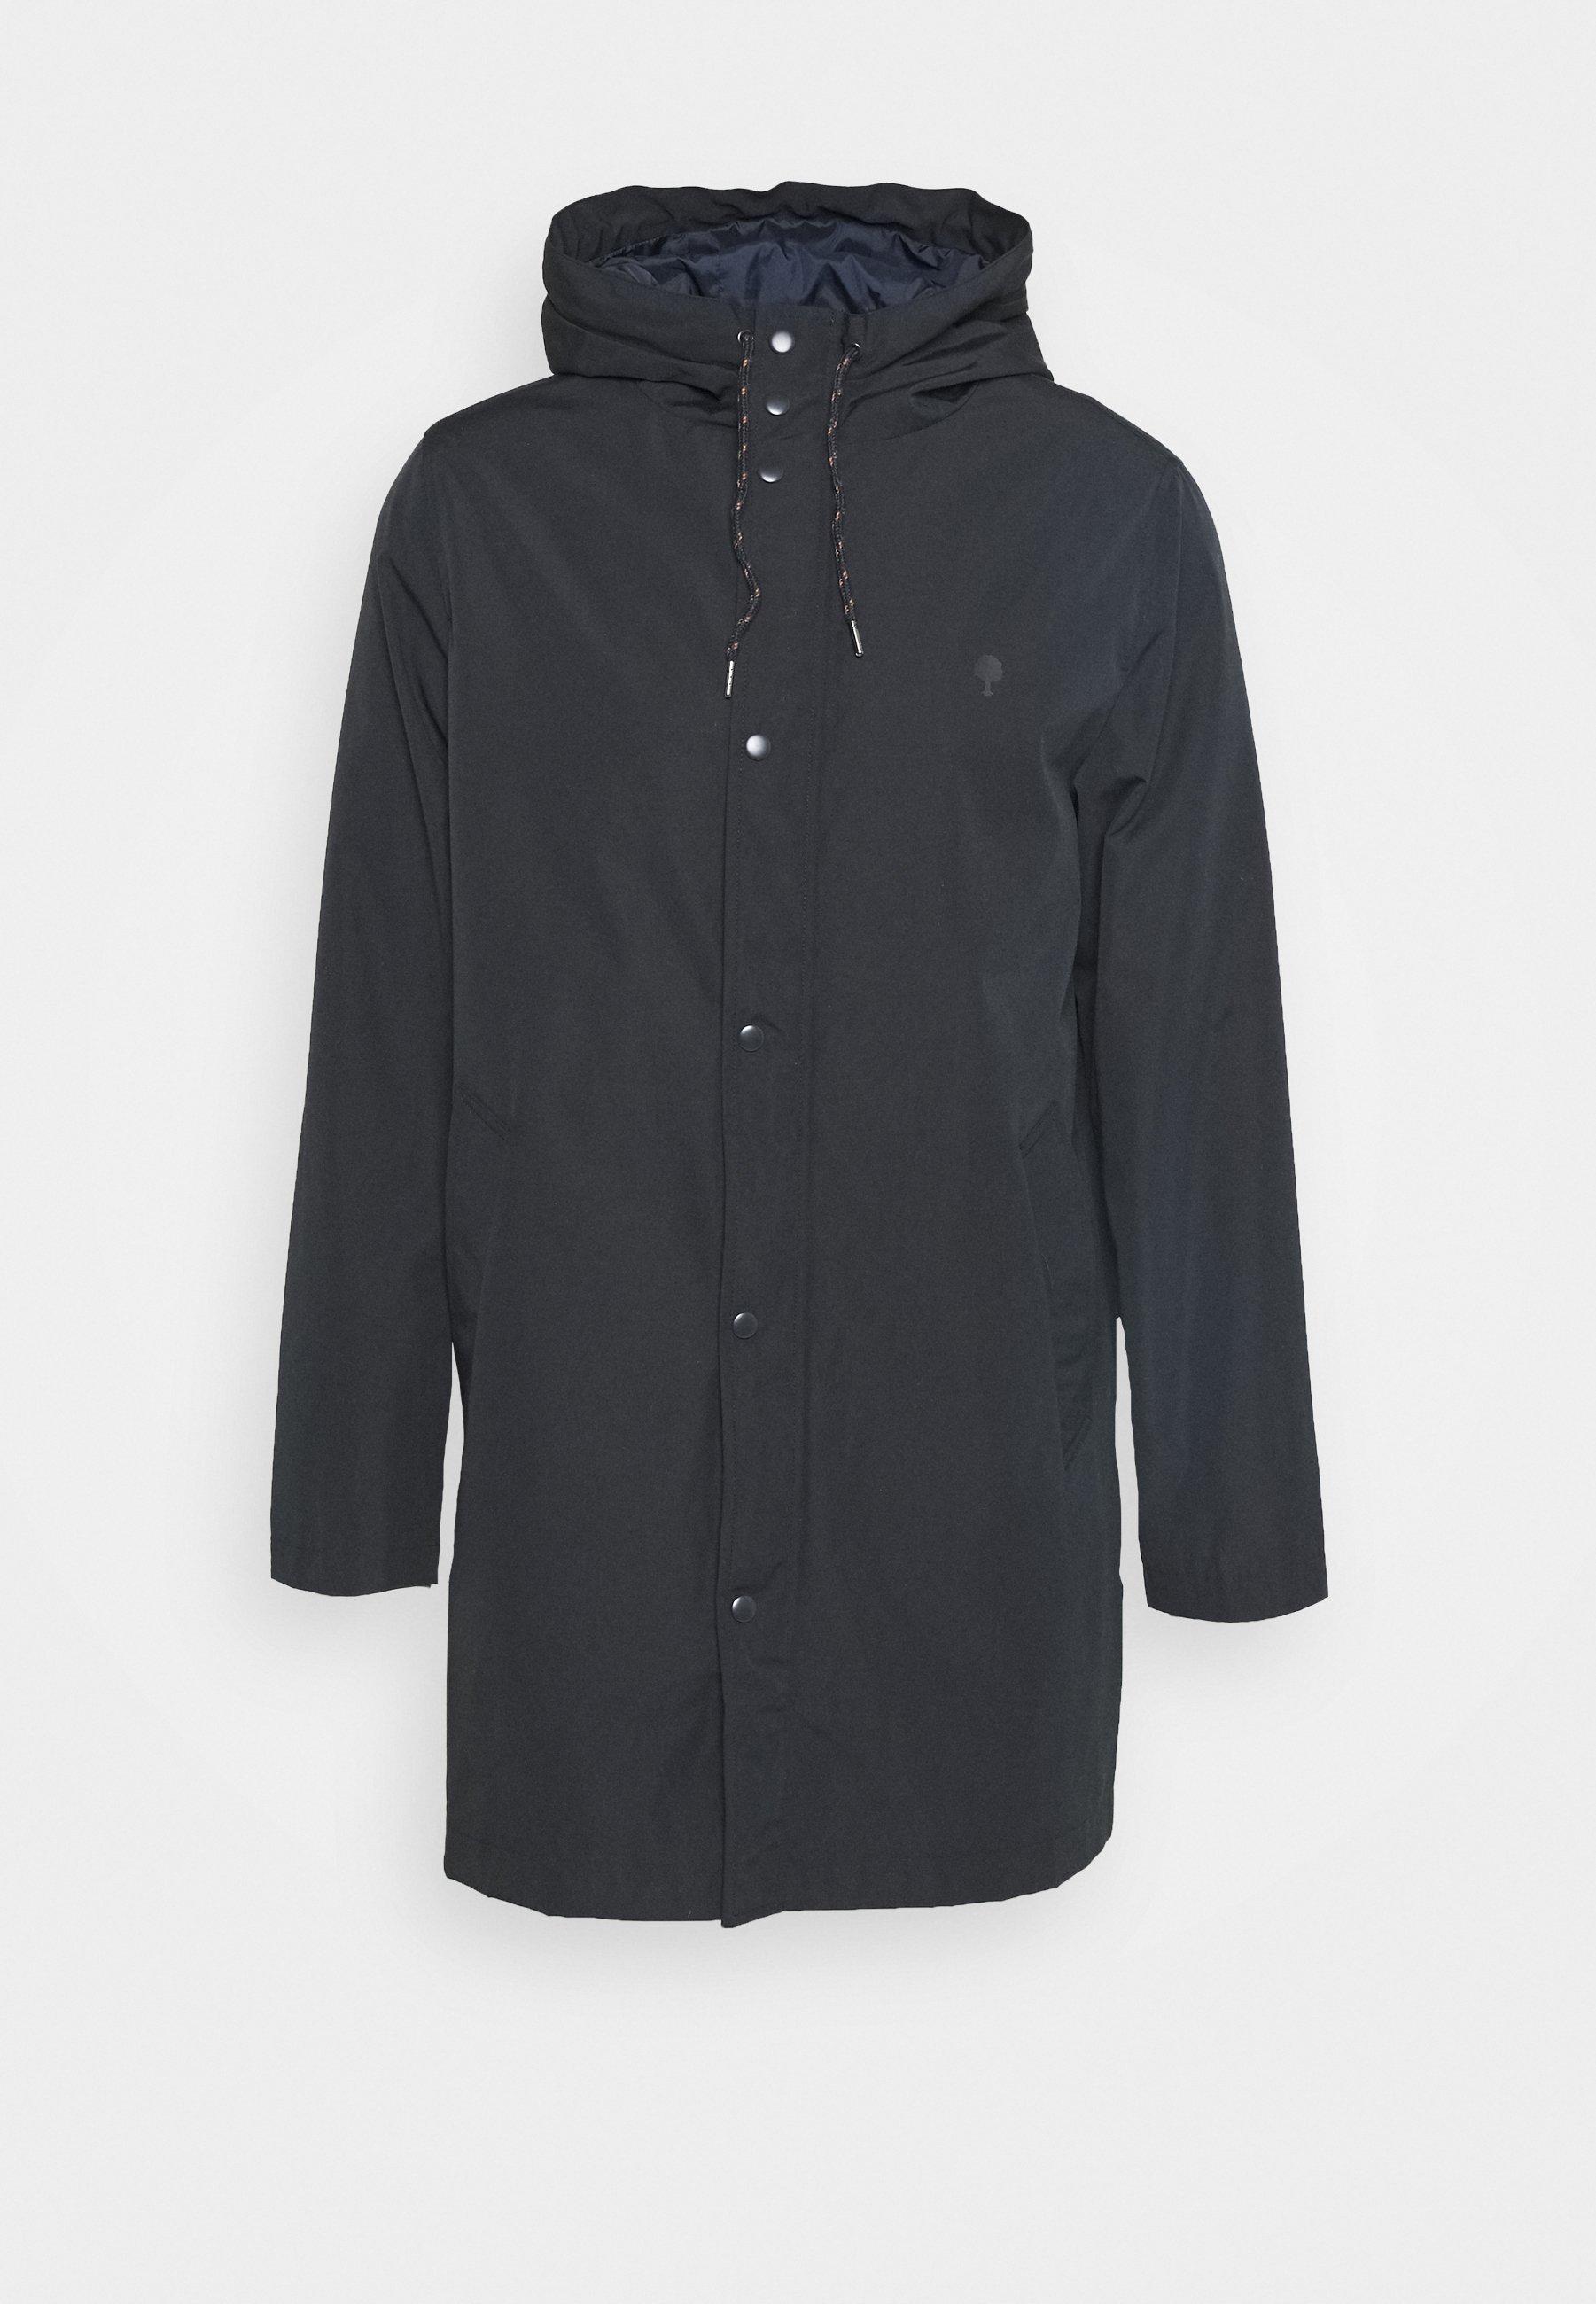 Homme GRESIGNE RAIN COAT - Veste imperméable